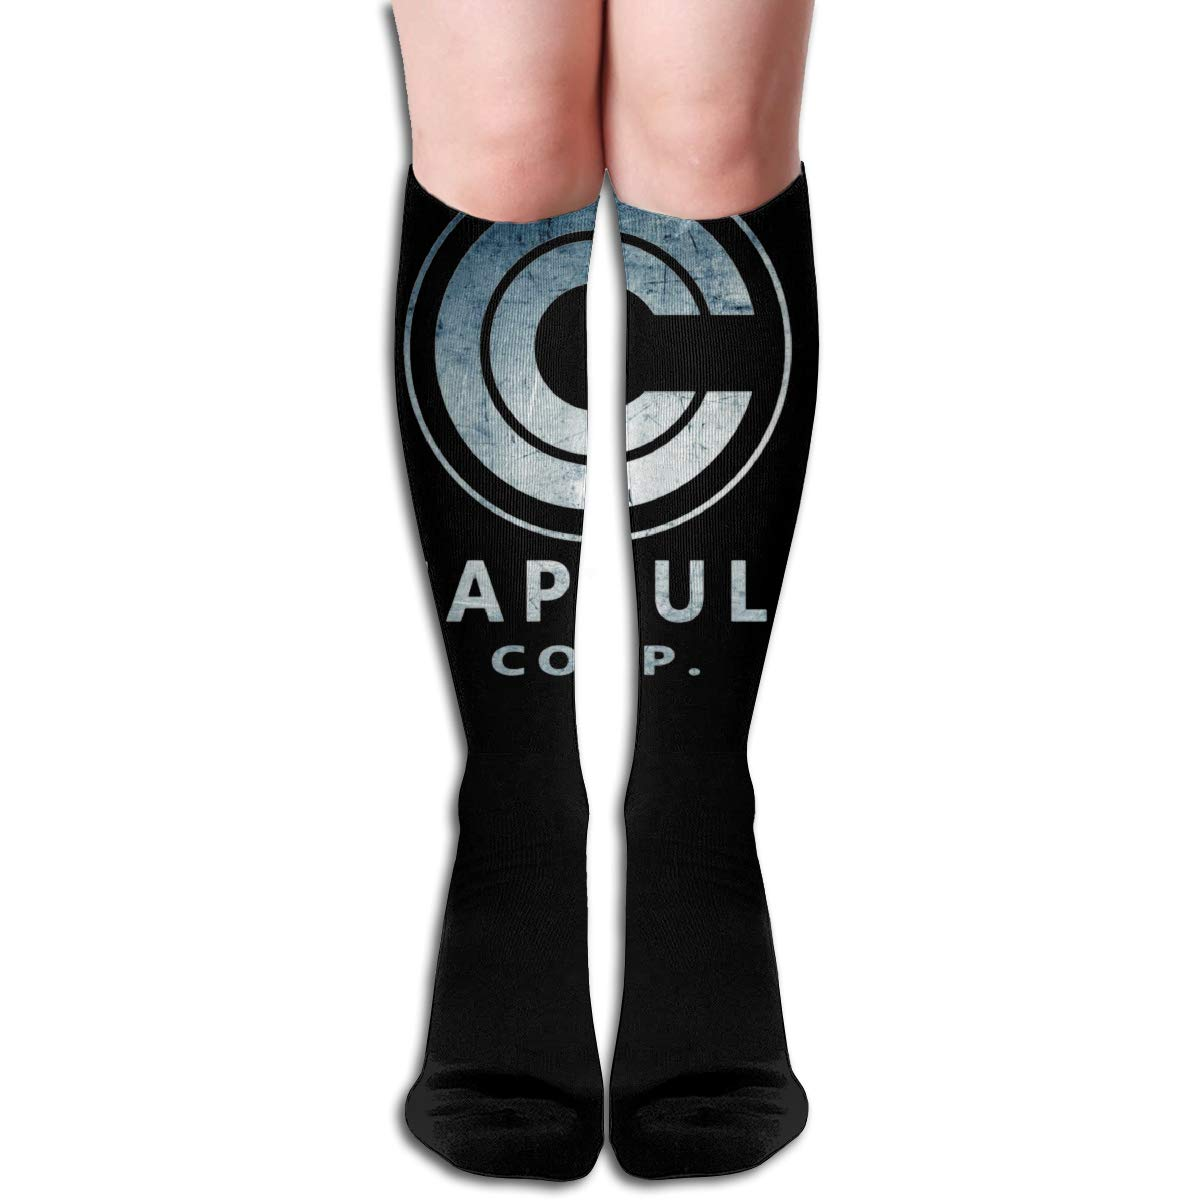 Motisure Capsule Corp Unisex Socks